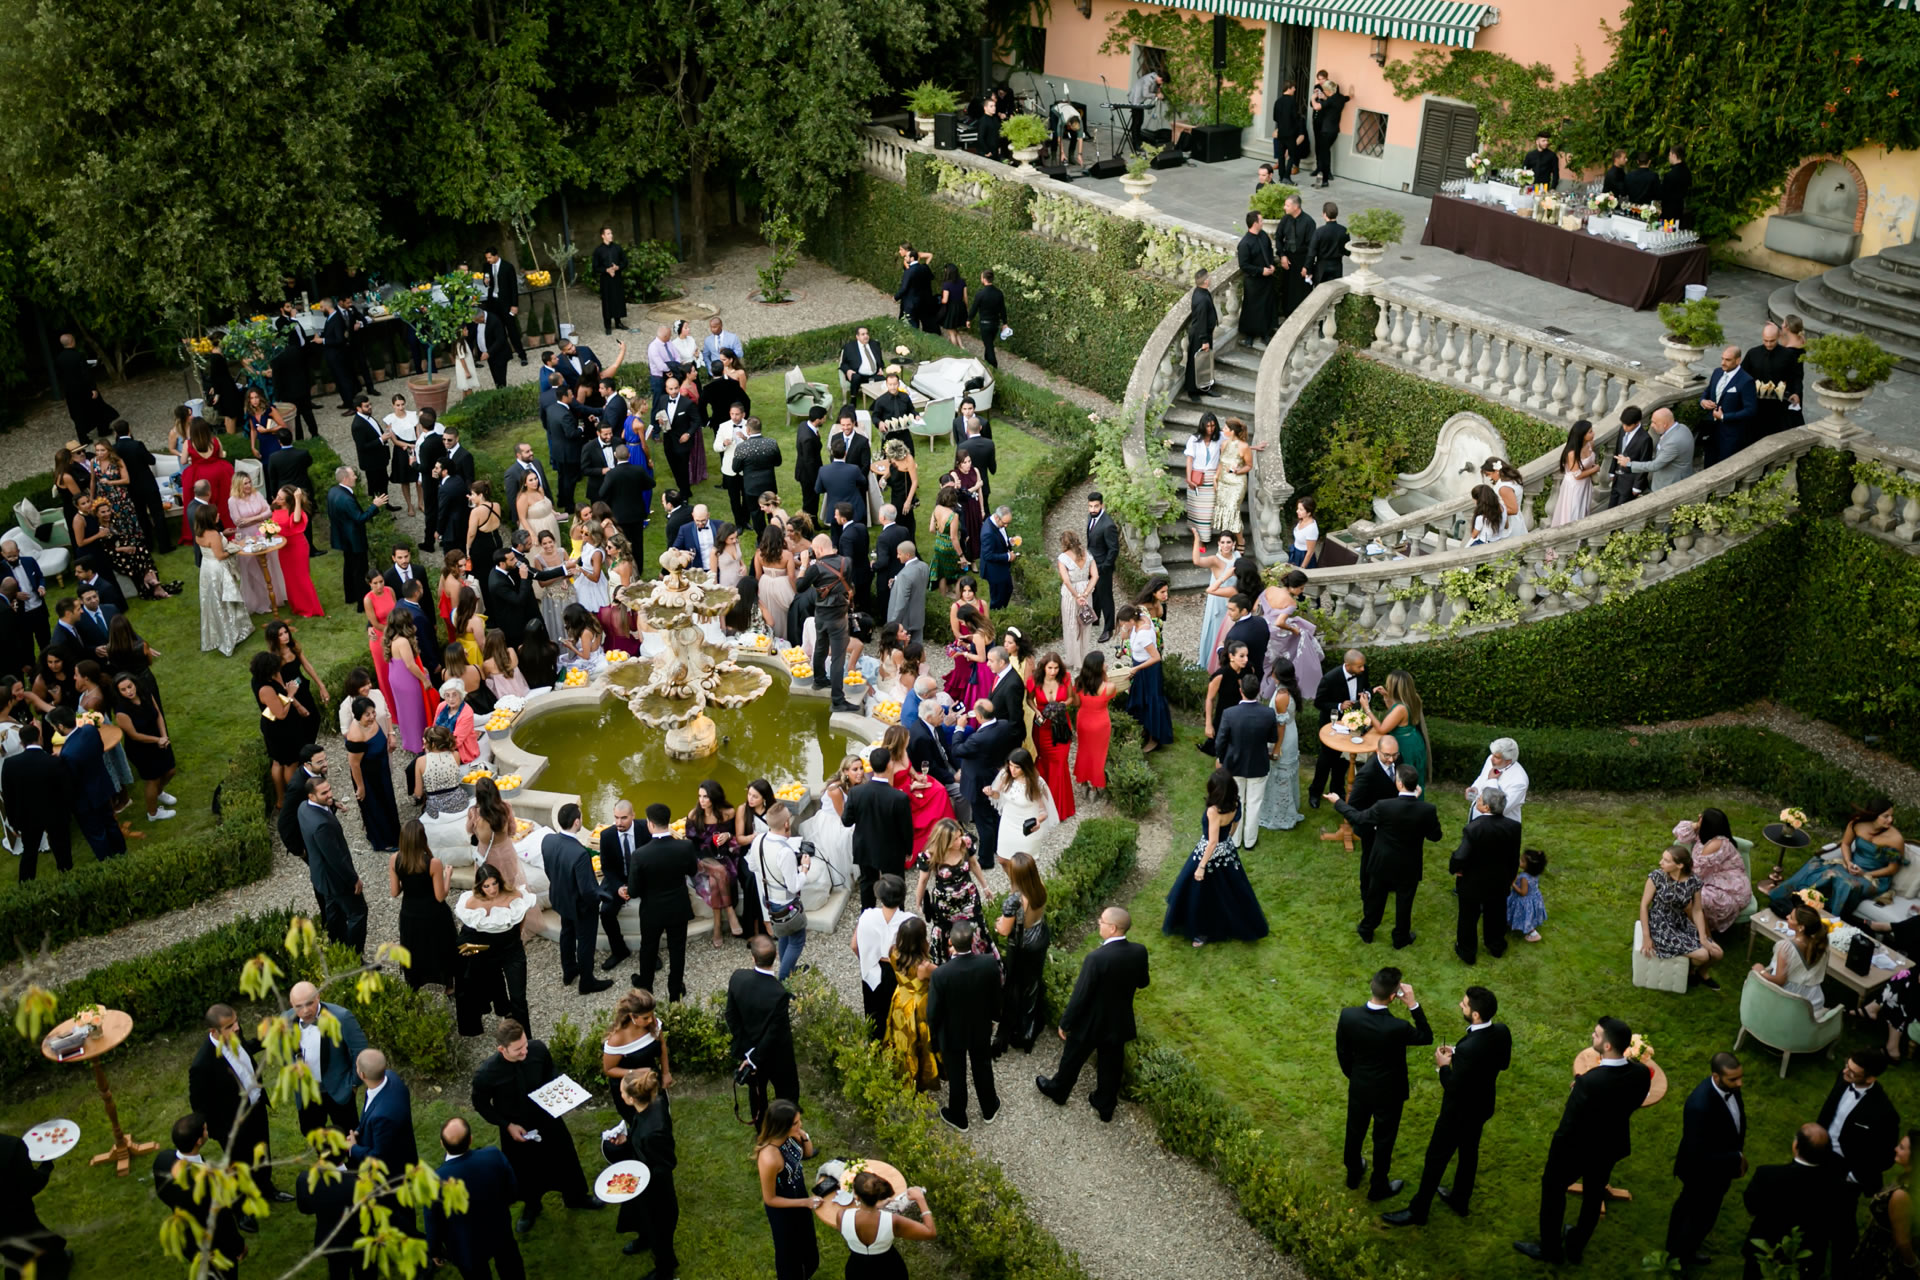 Invited - 39 :: Luxury wedding at Il Borro :: Luxury wedding photography - 38 :: Invited - 39